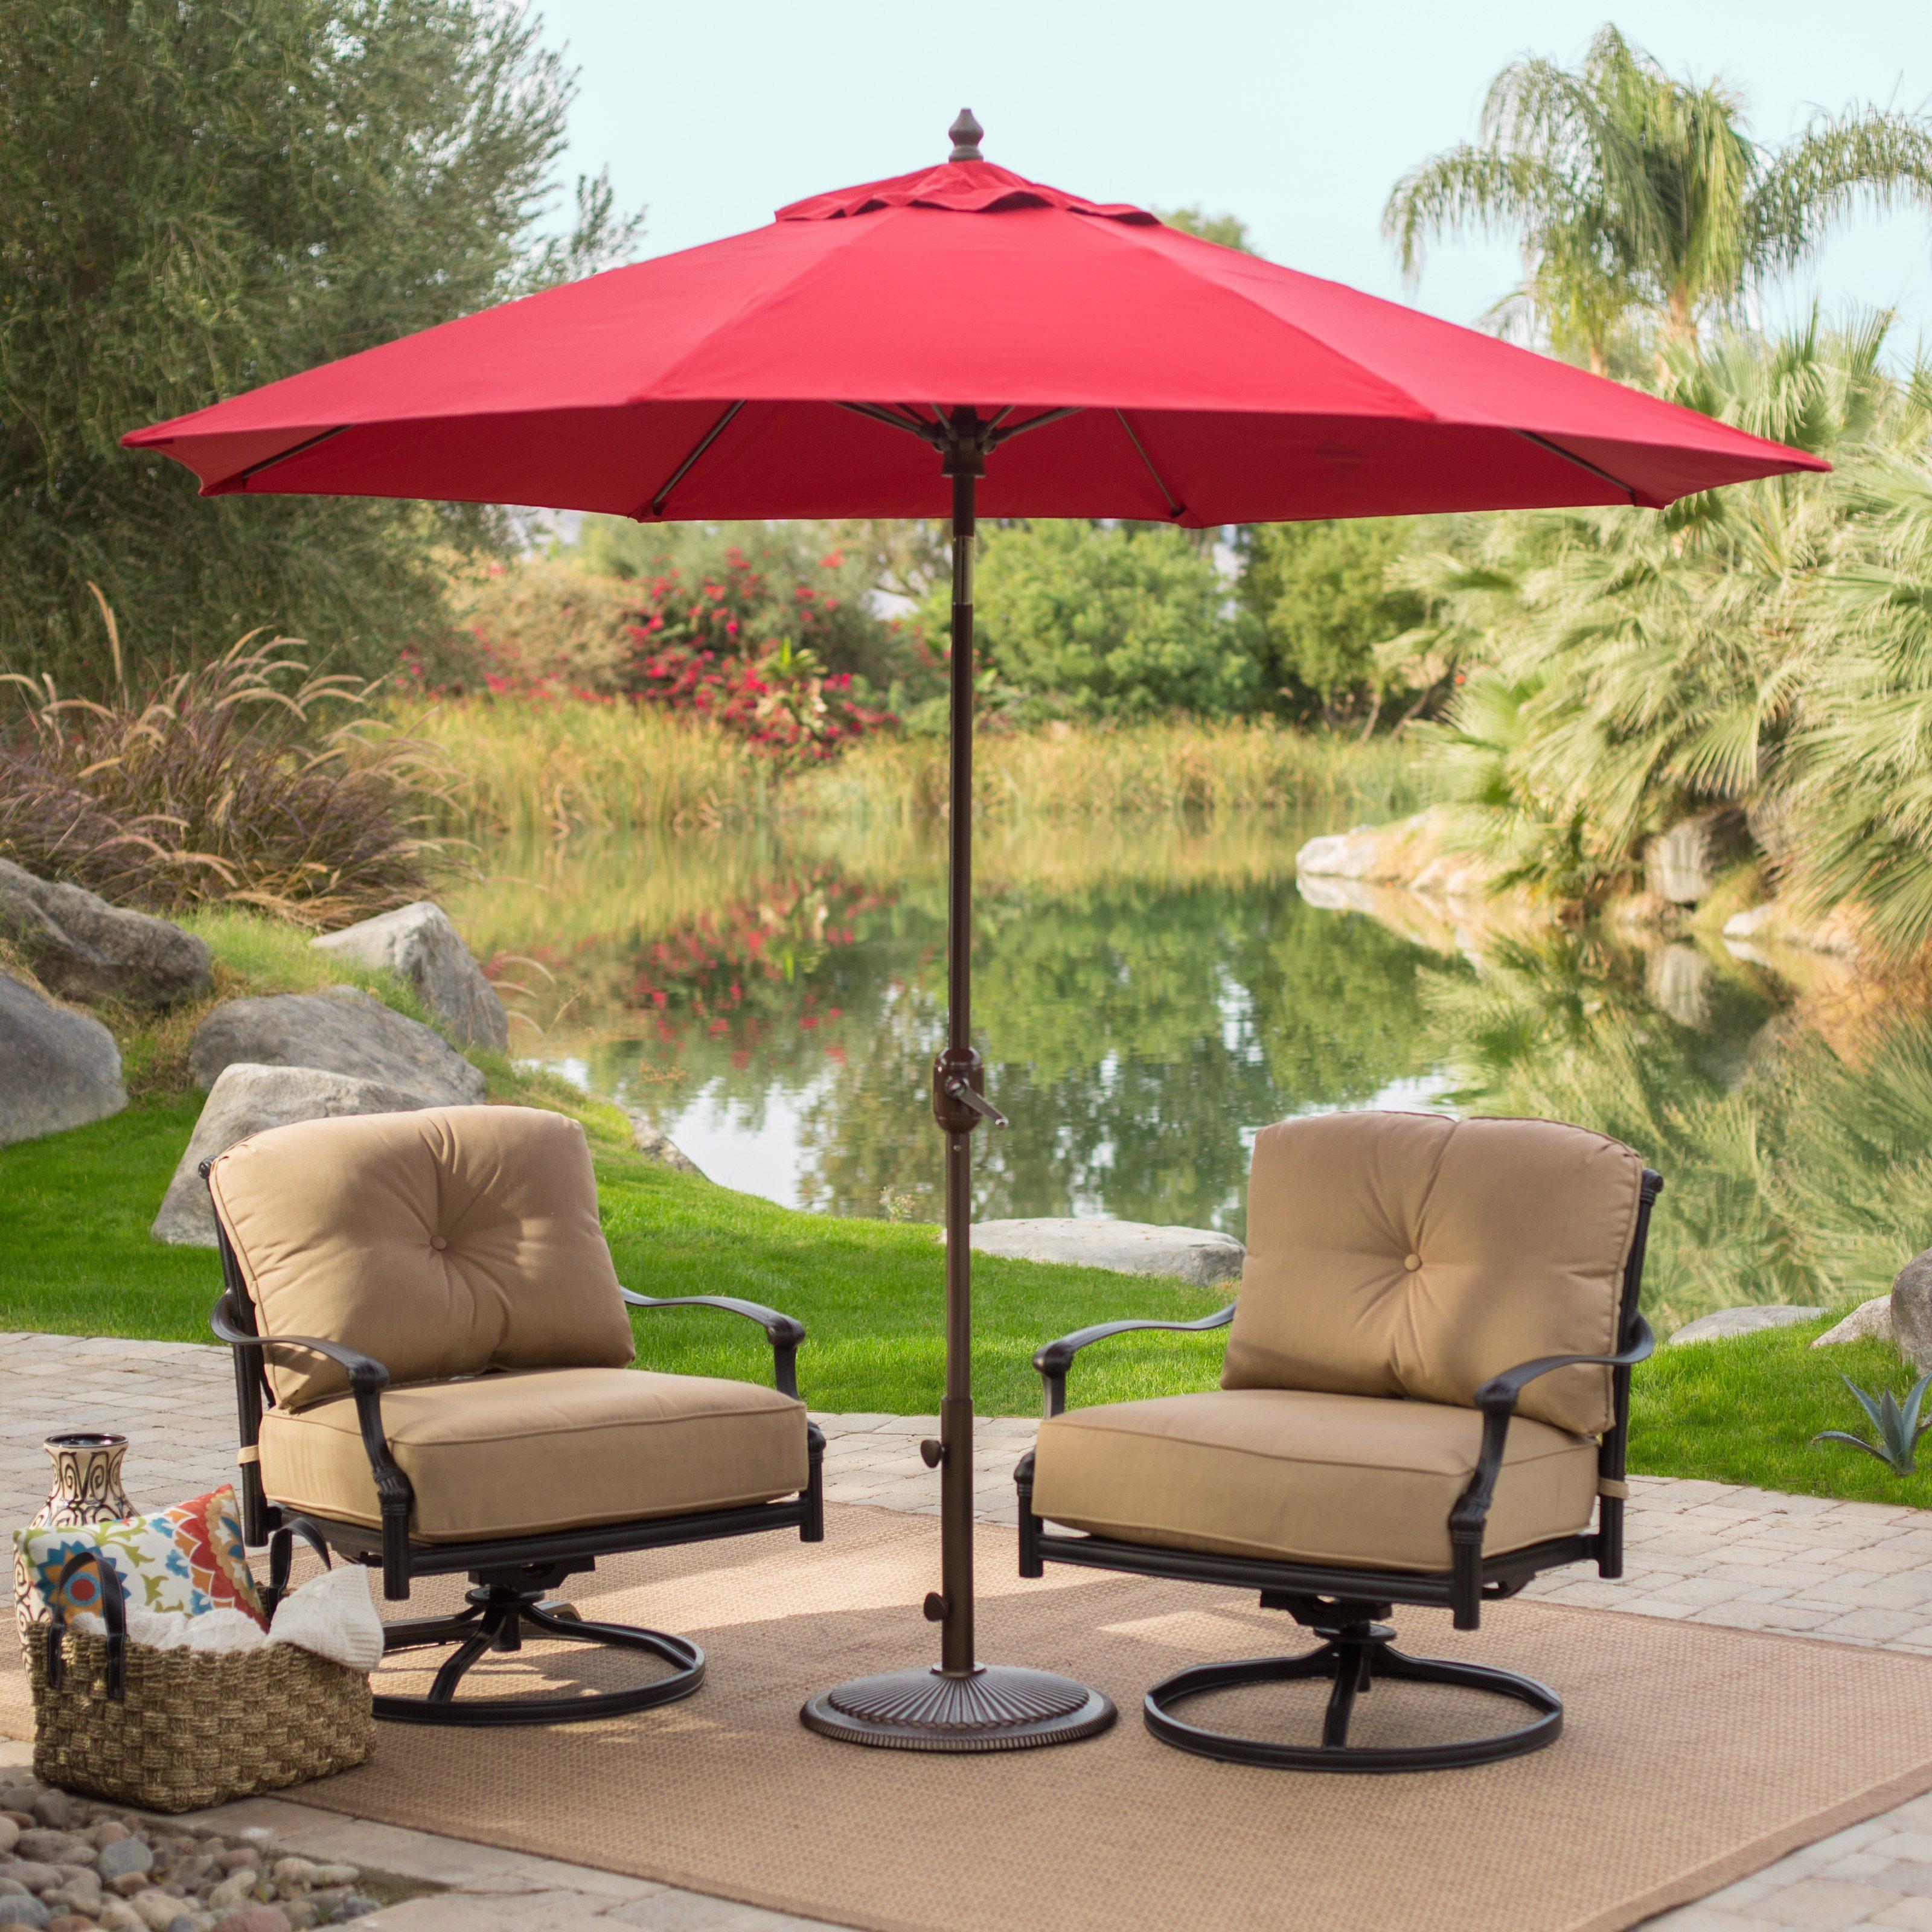 Coral Coast 9-ft. Sunbrella Deluxe Tilt Aluminum Patio Umbrella ...